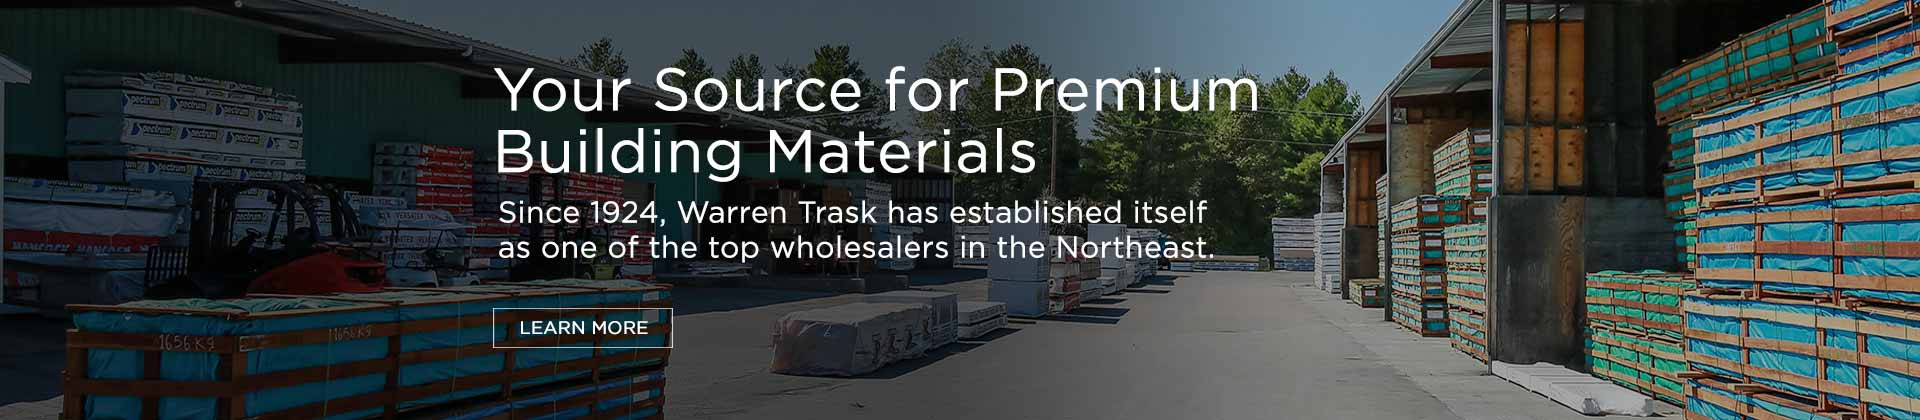 Warren Trask, Warren Trask Company, Premium Building Materials, Building Materials